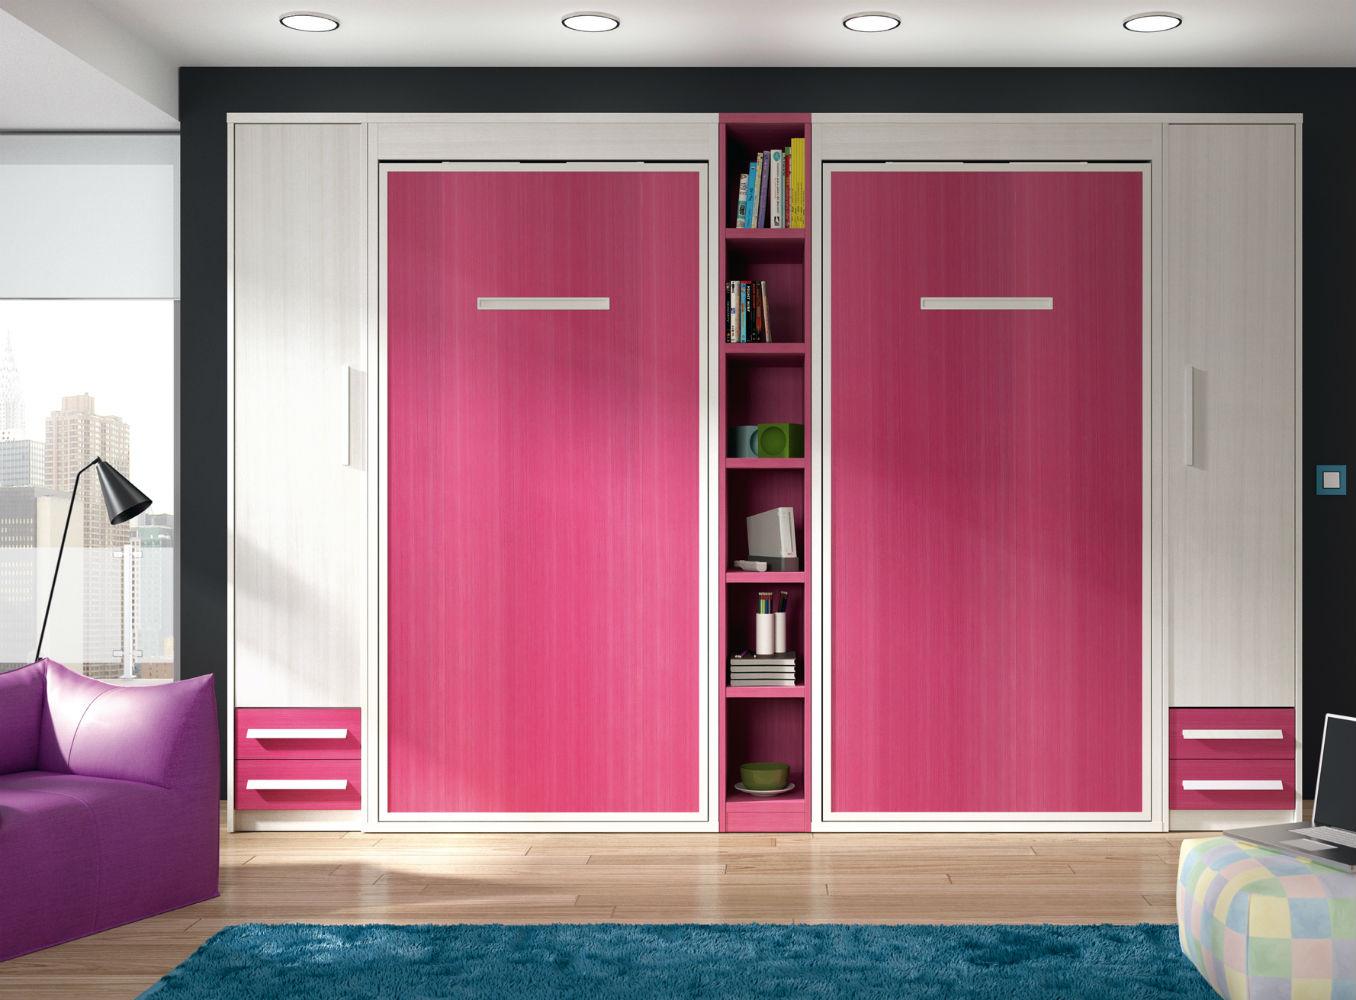 Dormitorio infantil juvenil moderno literas abatibles 69 f225 for Dormitorios juveniles abatibles